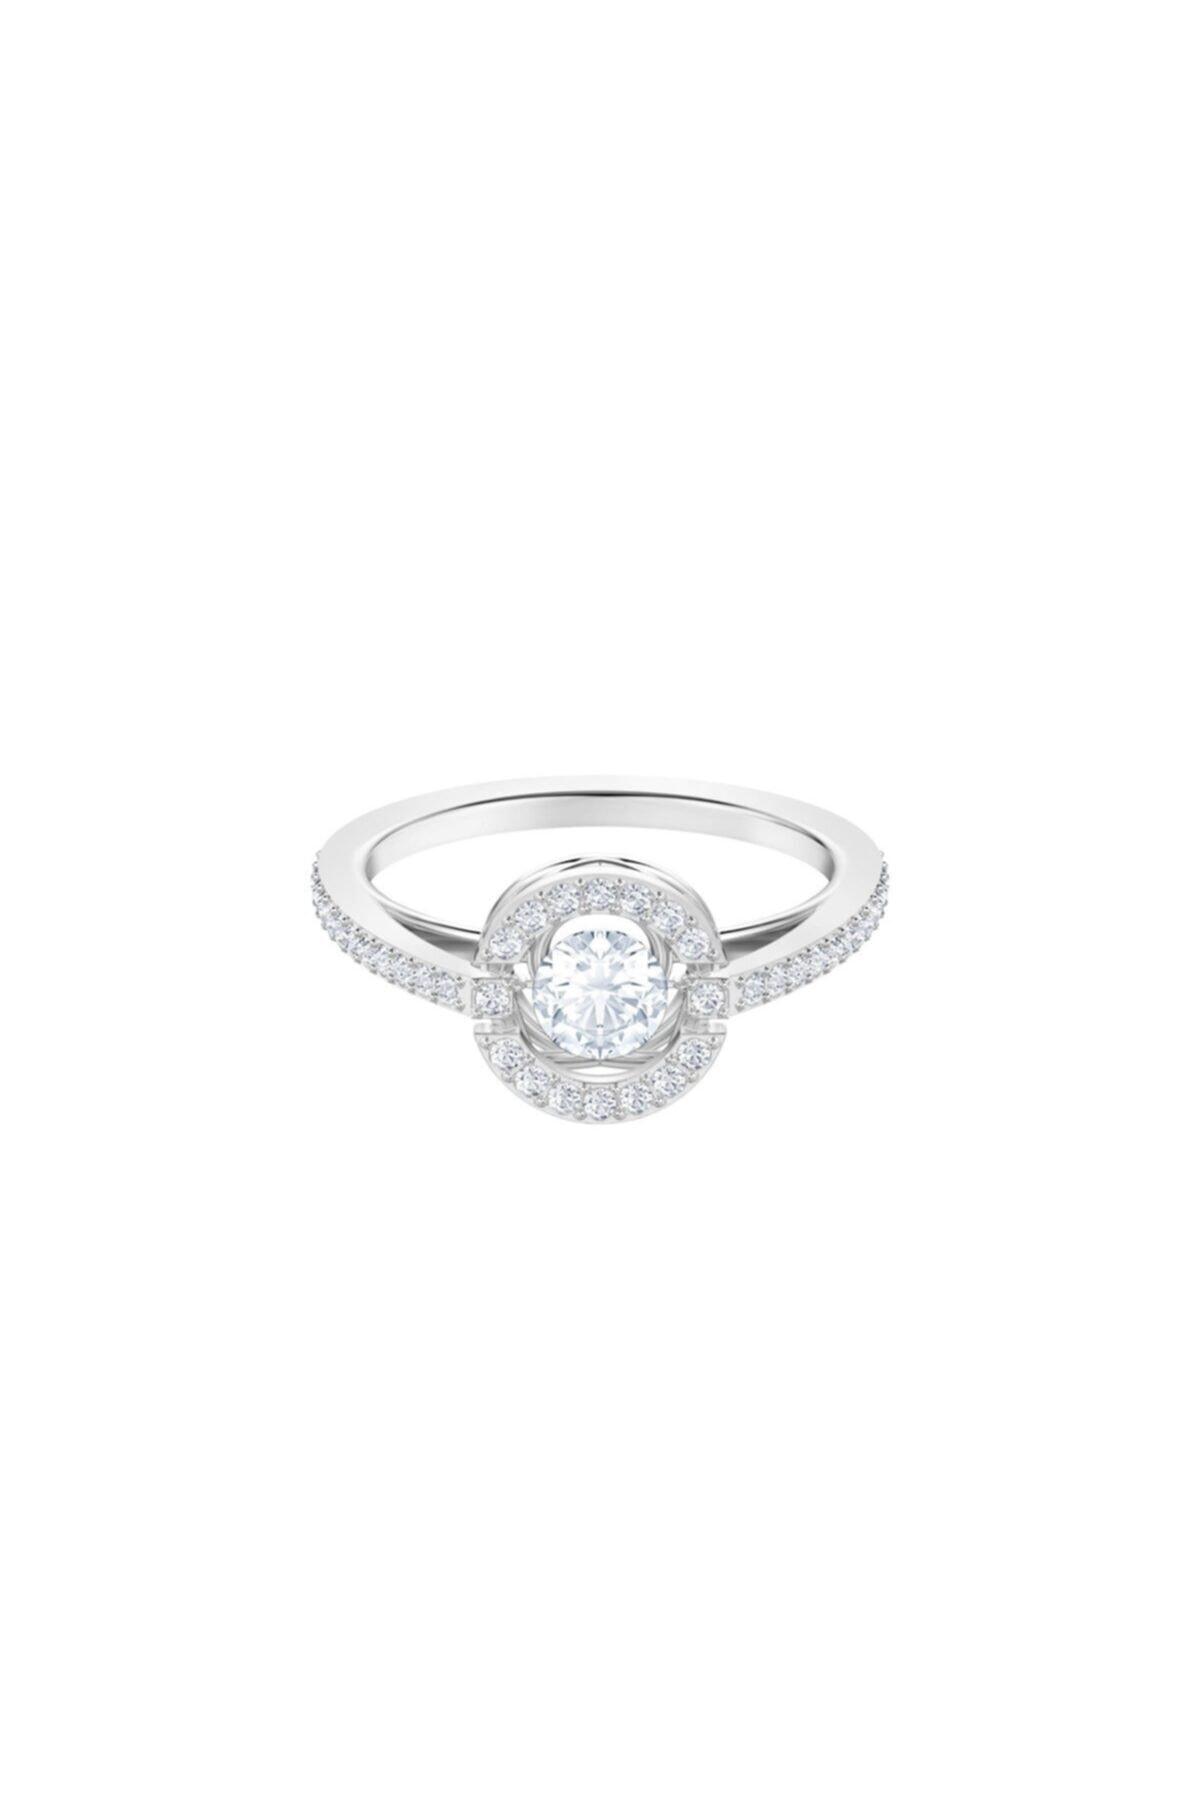 Swarovski Kadın Yüzük Sparkling Dc:Ring Rnd Czwh/Rhs 55 5465280 1